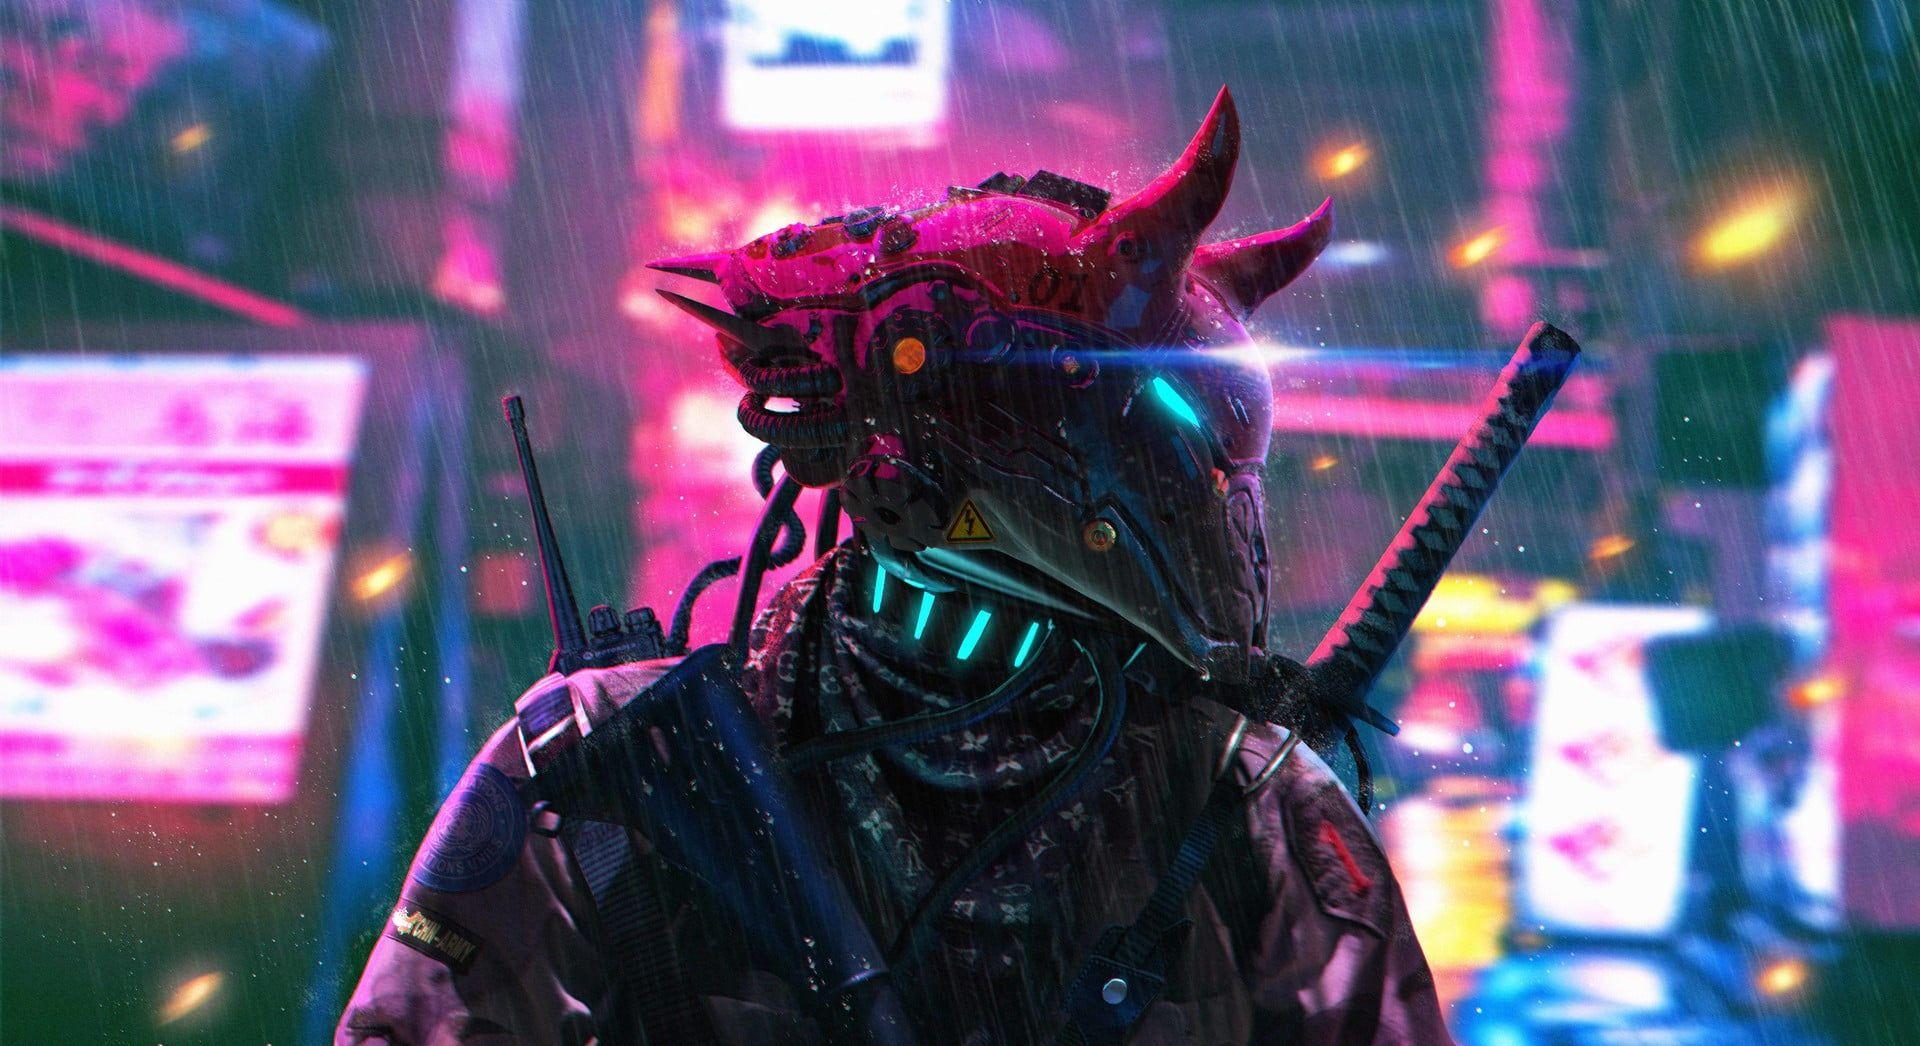 Cyberpunk Neon Futuristic Science Fiction Neon Lights Futuristic City Katana Rain 1080p Wallpaper Hdwallpap In 2020 Cyberpunk Aesthetic Cyberpunk Art Cyberpunk